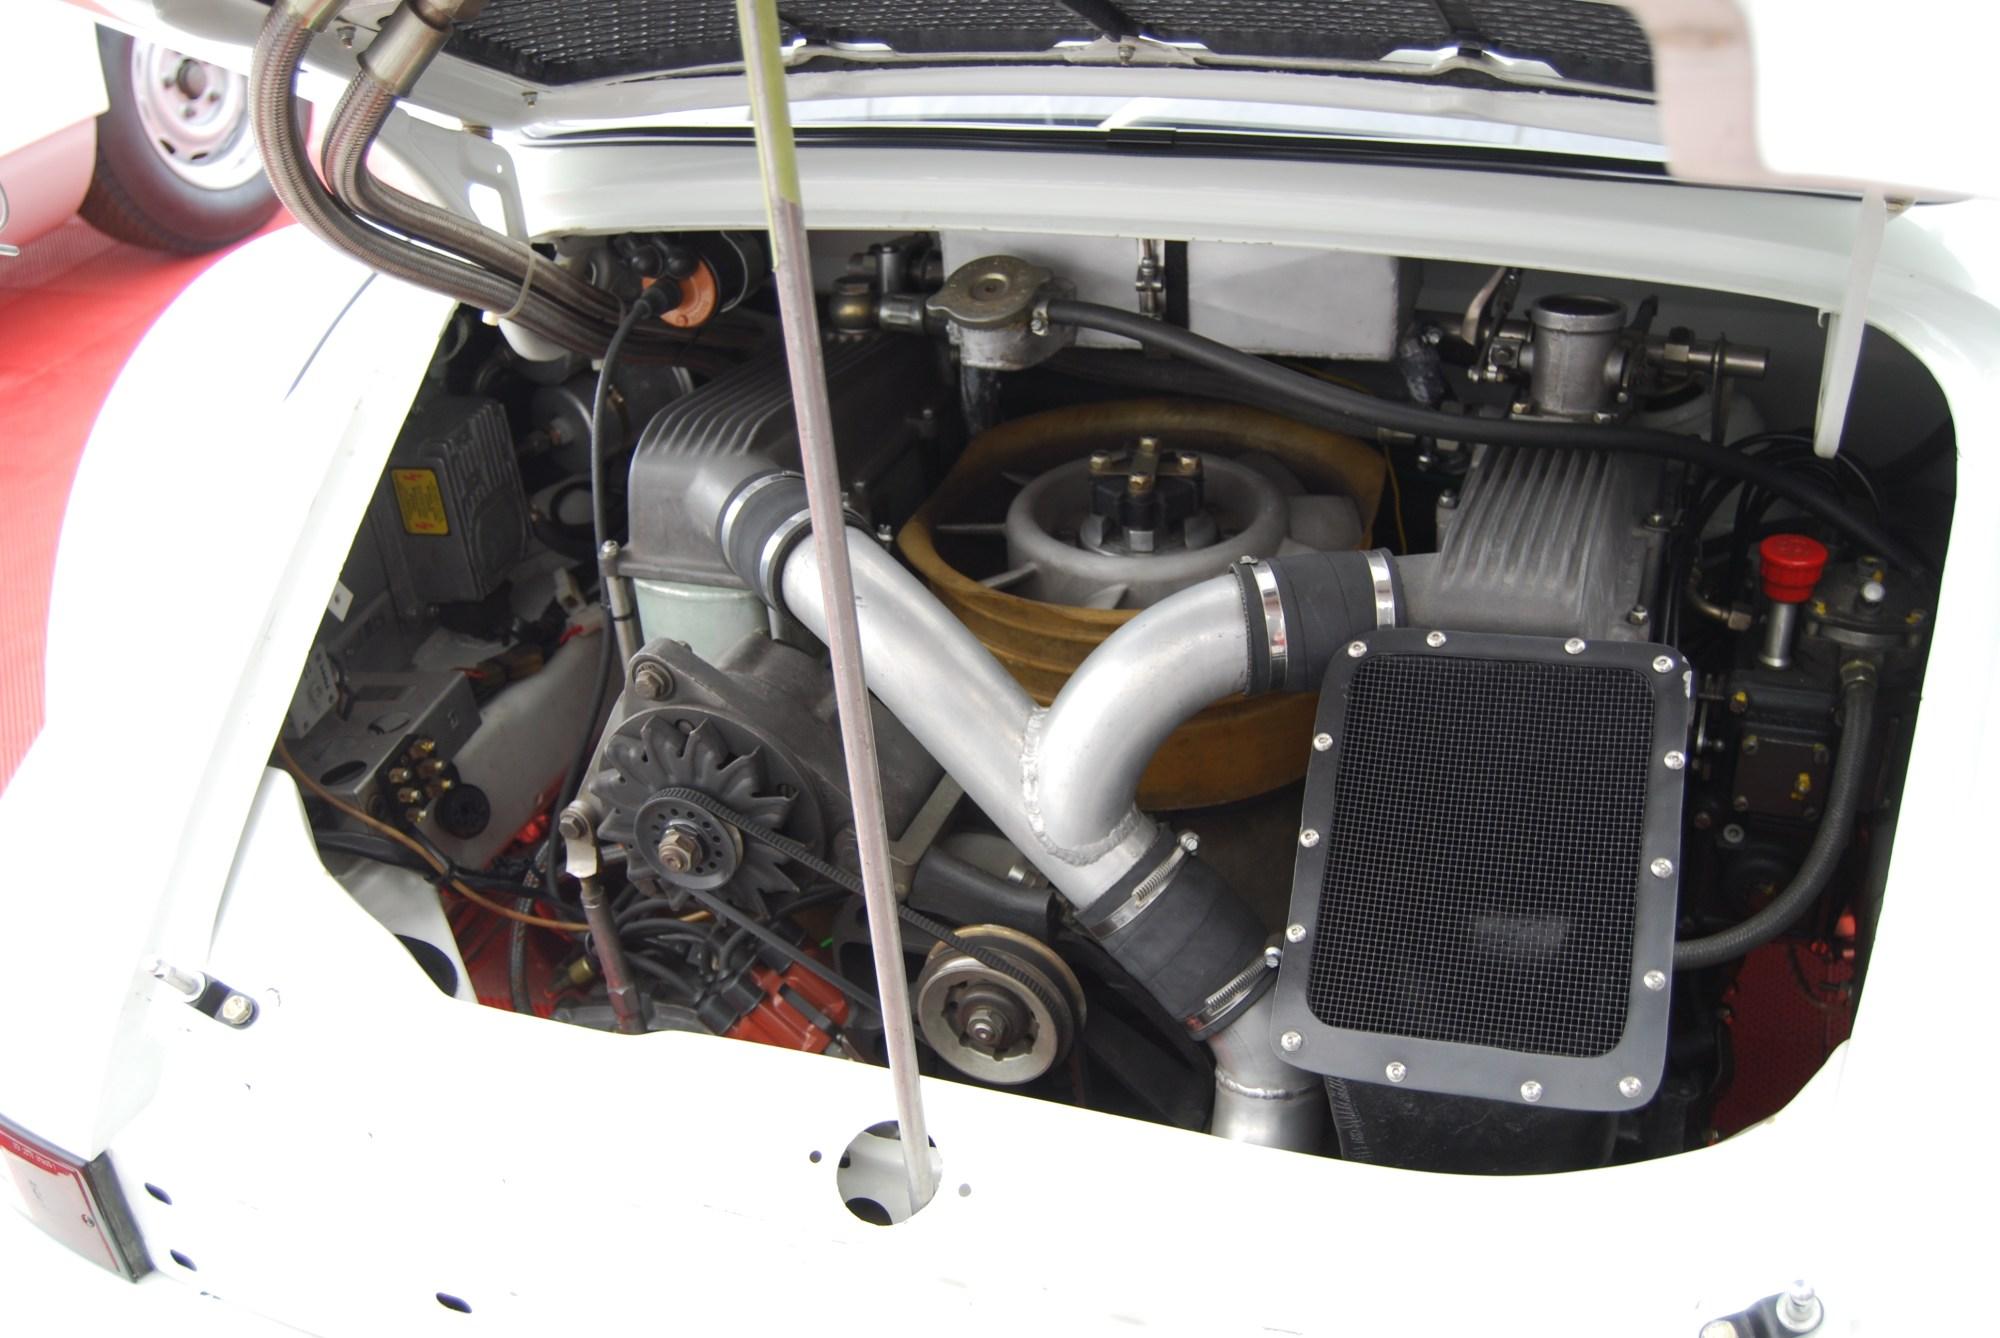 hight resolution of file porsche air cooled flat 6 engine 6268824674 jpg